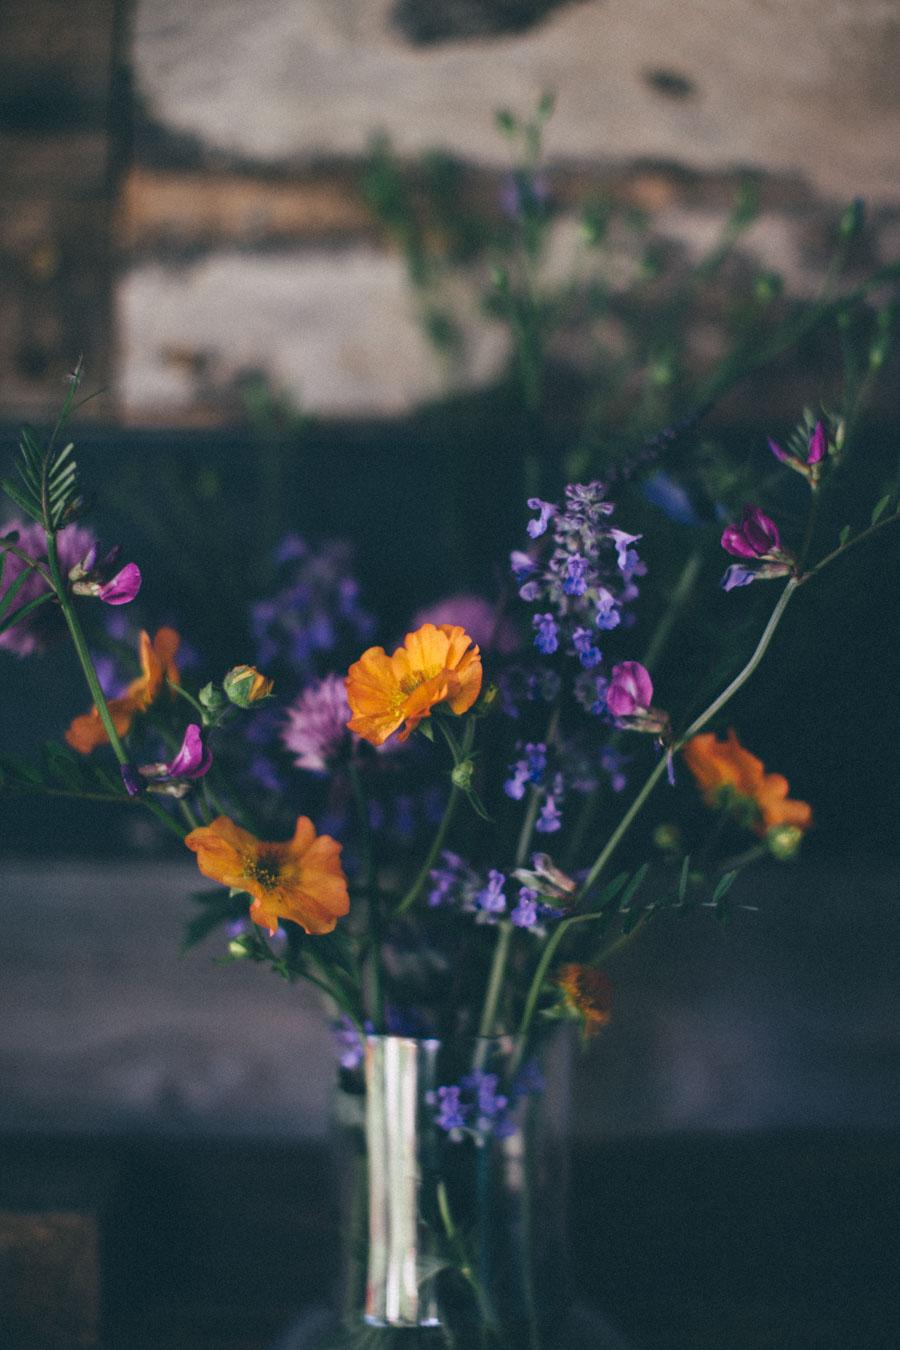 Hand picked garden blooms